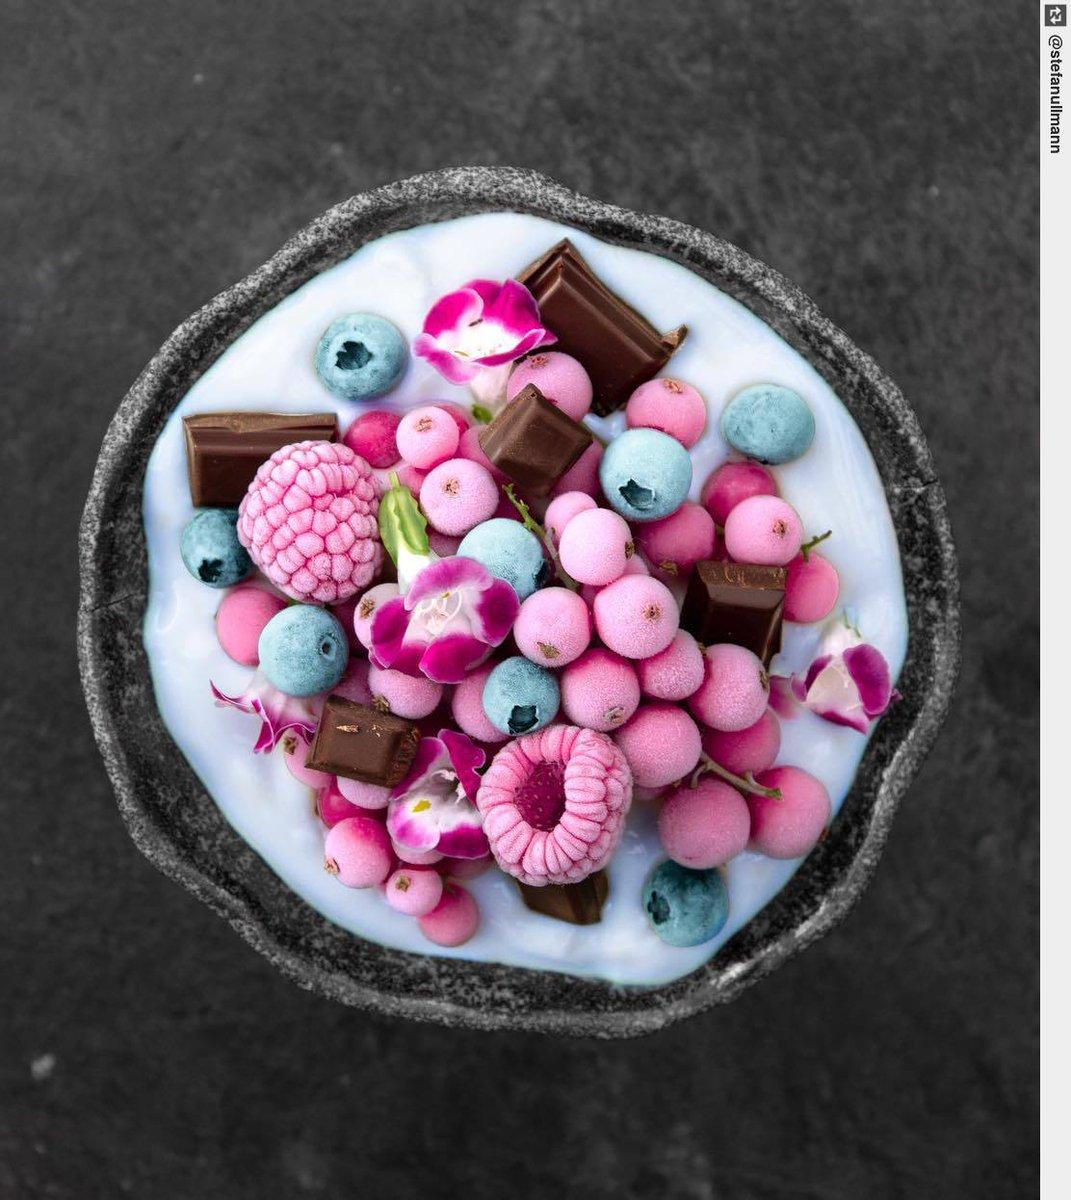 BLUE SMOOTHIE BERRY BOWL 💕✨ •••••••••••••••••• #holzkirchen #style #veggie #vegan #food #yummy https://t.co/0j5f6z8zh4